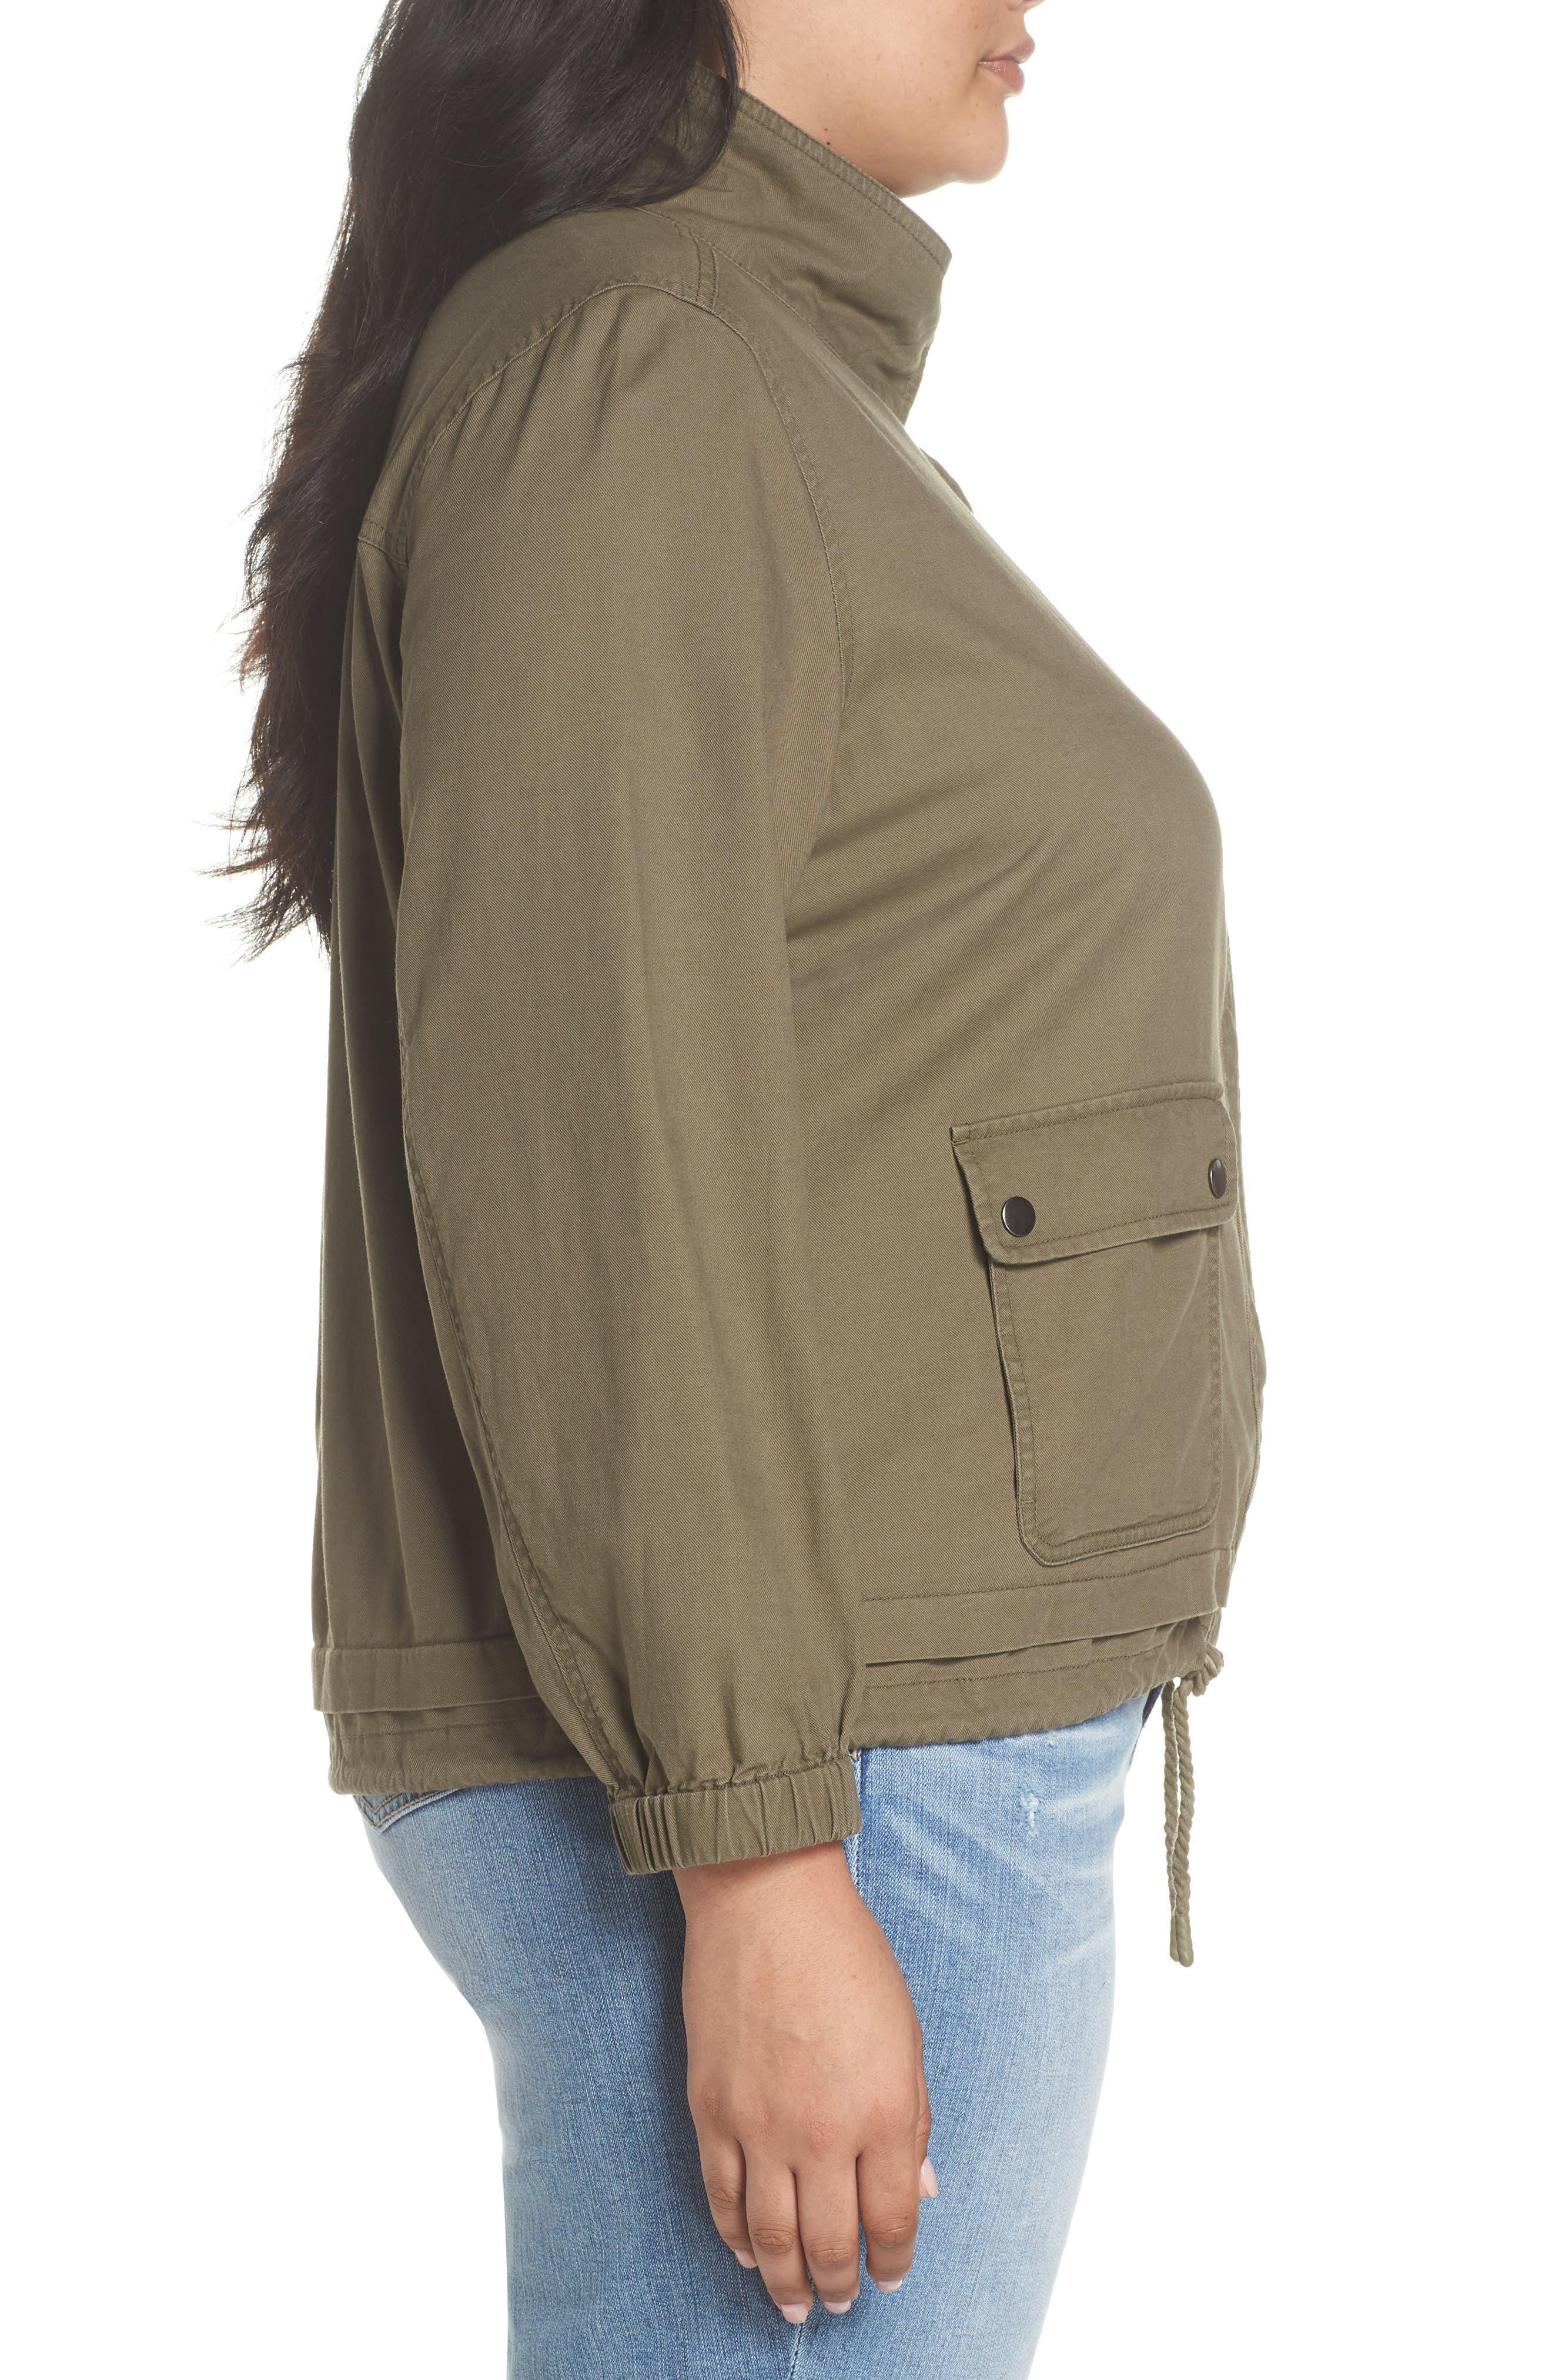 Snap Pocket Utility Jacket,                             Alternate thumbnail 3, color,                             Olive Kalamata